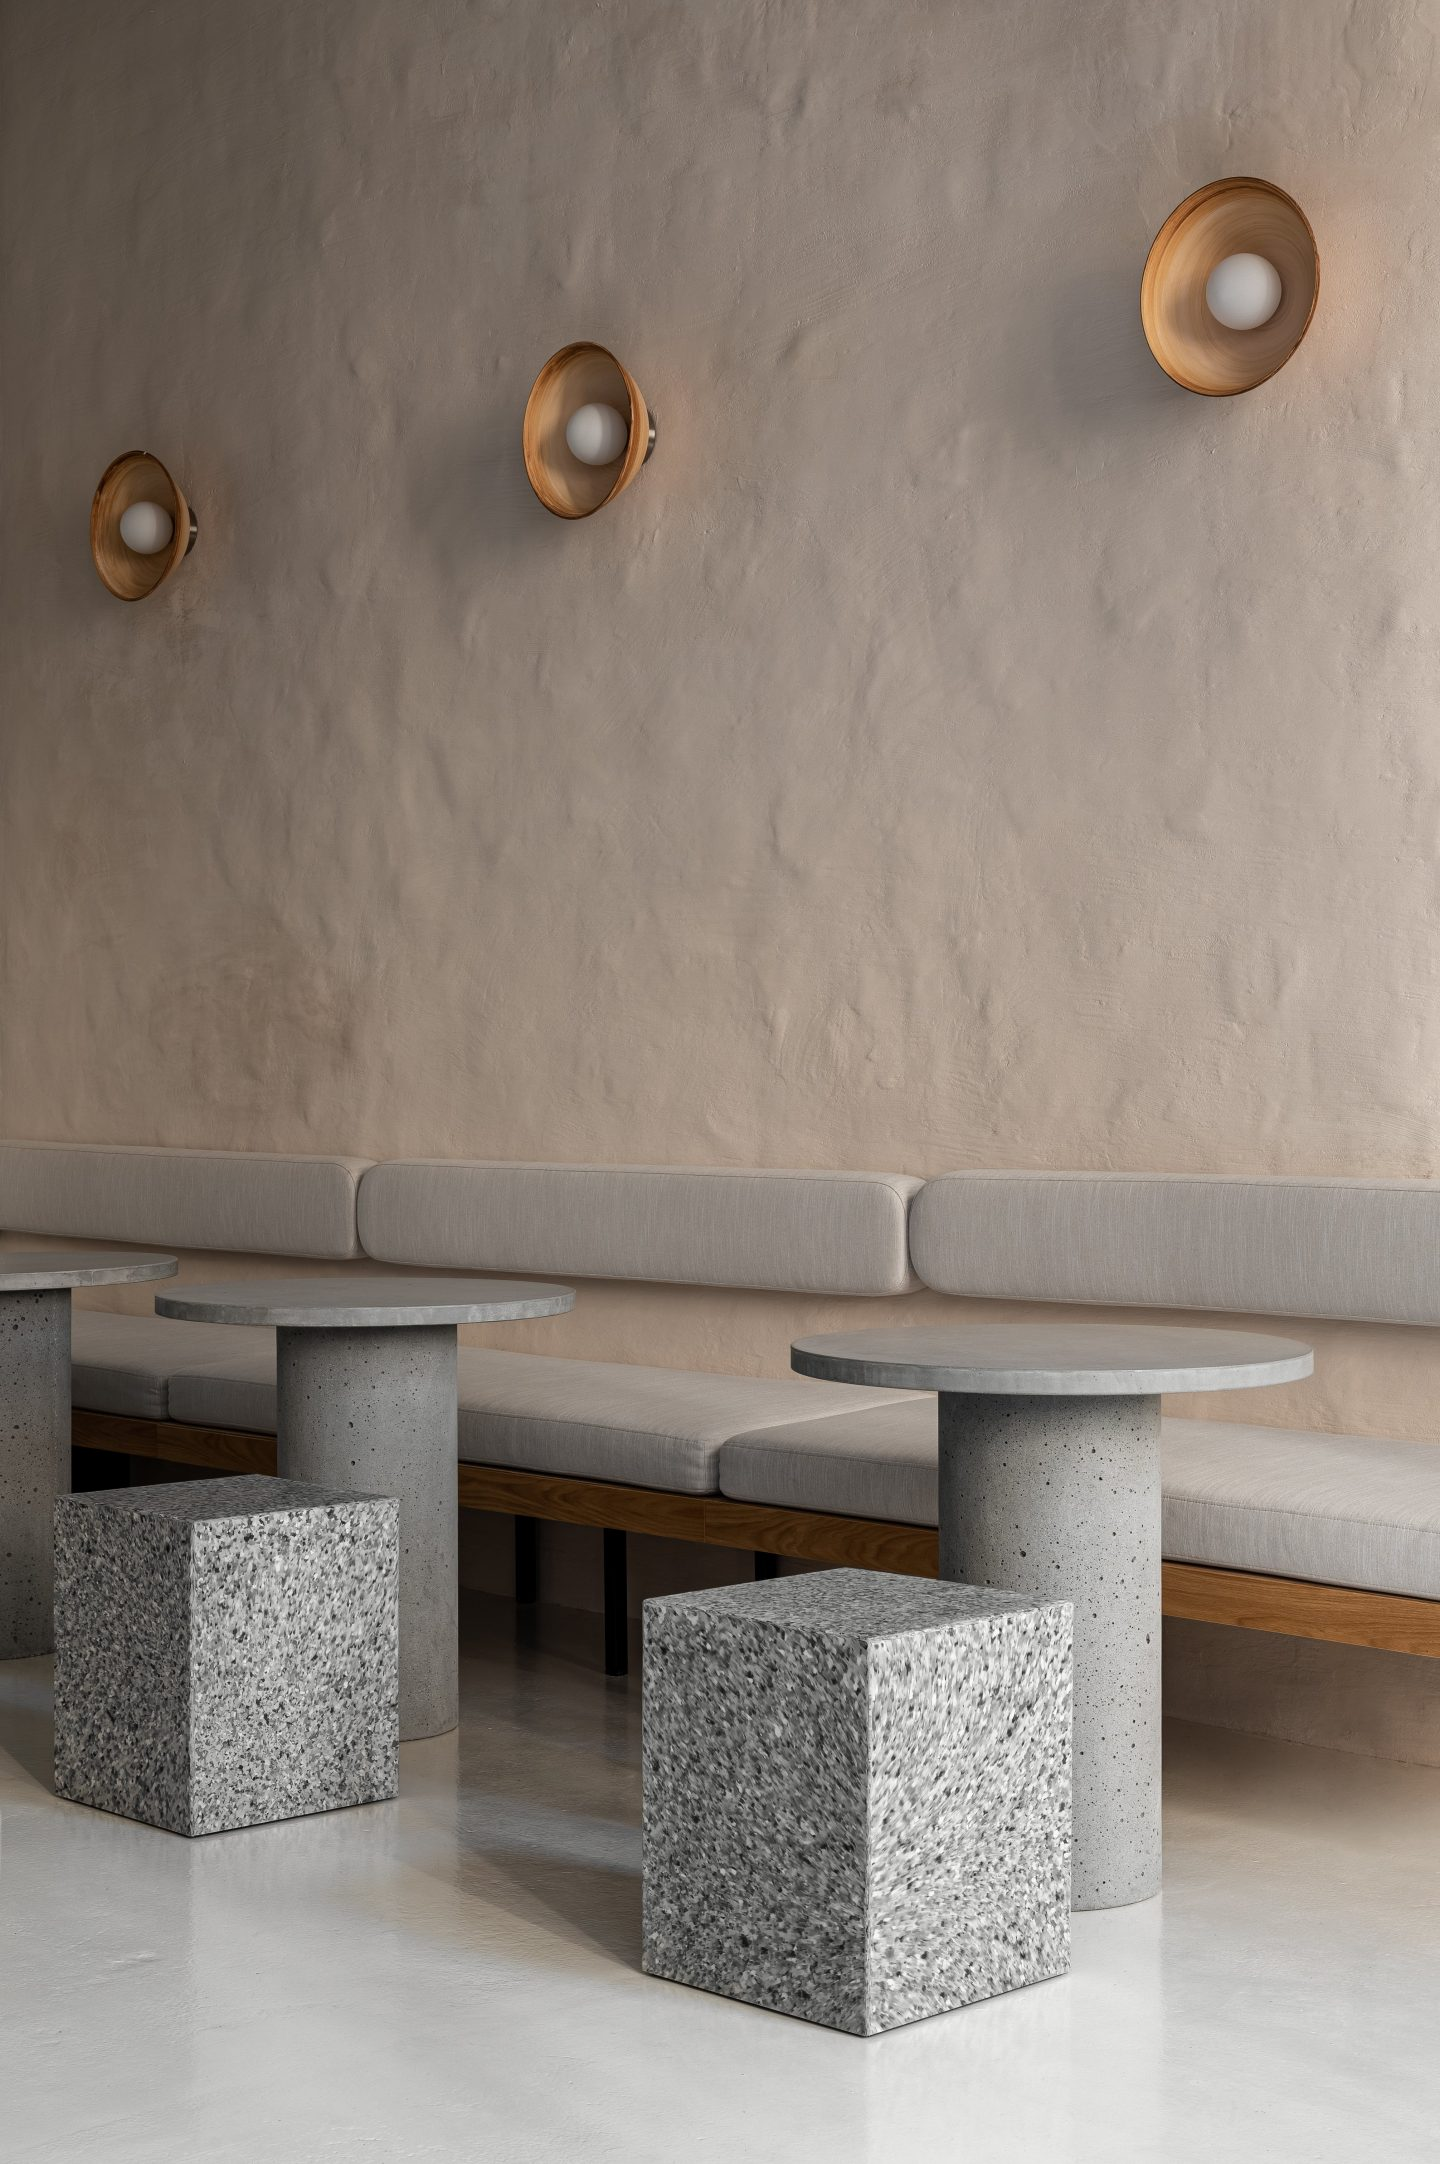 IGNANT-Design-Interior-Istetyka-14